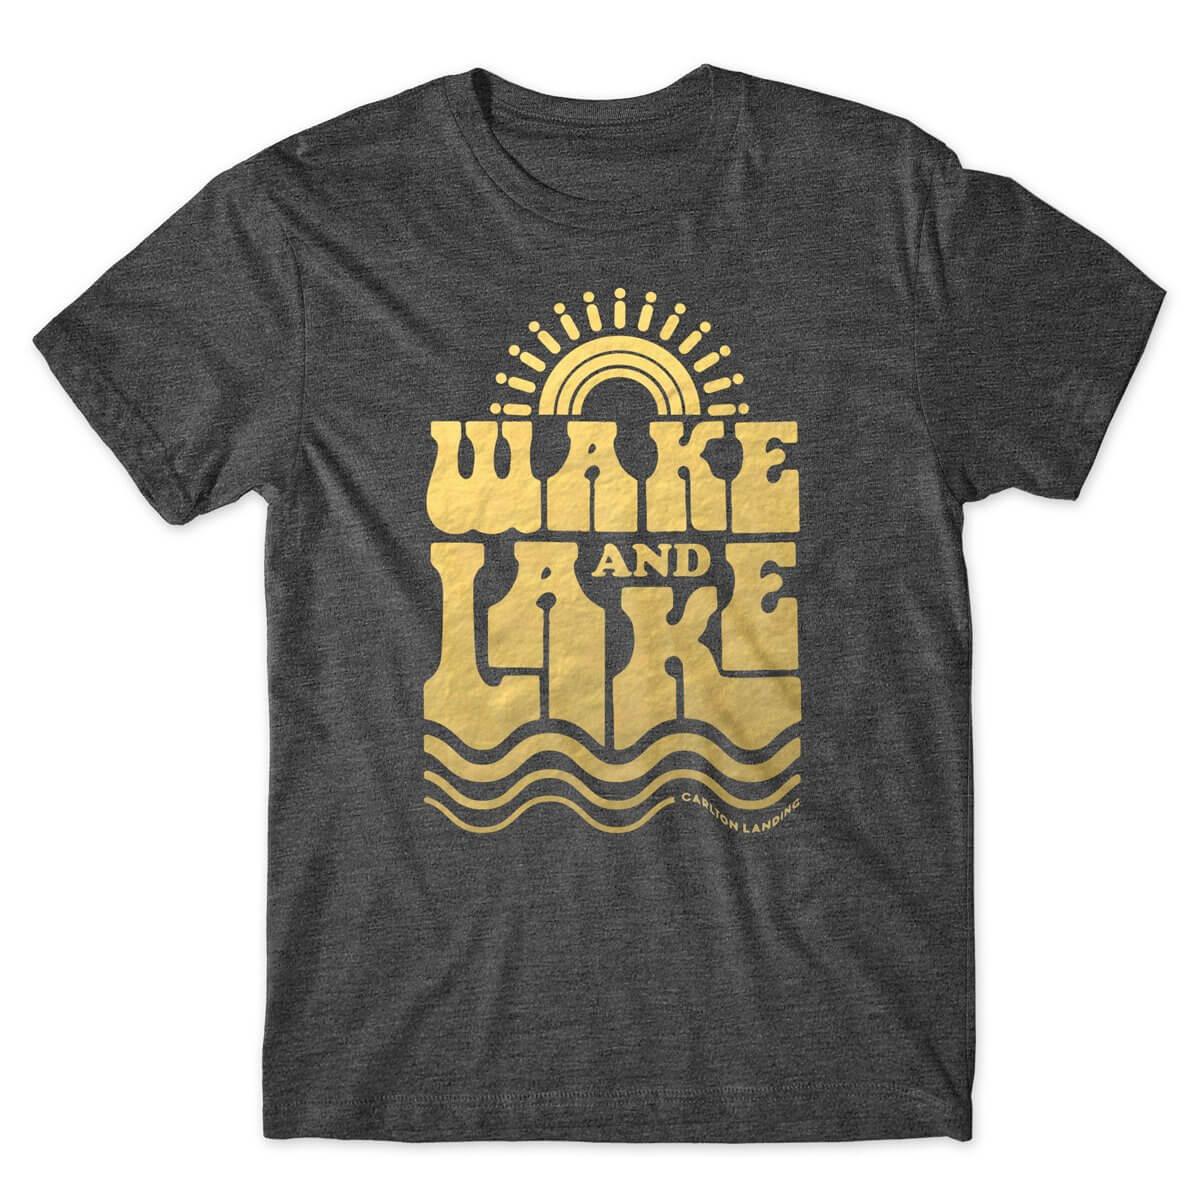 Carlton Landing Wake and Lake charcoal heather tshirt